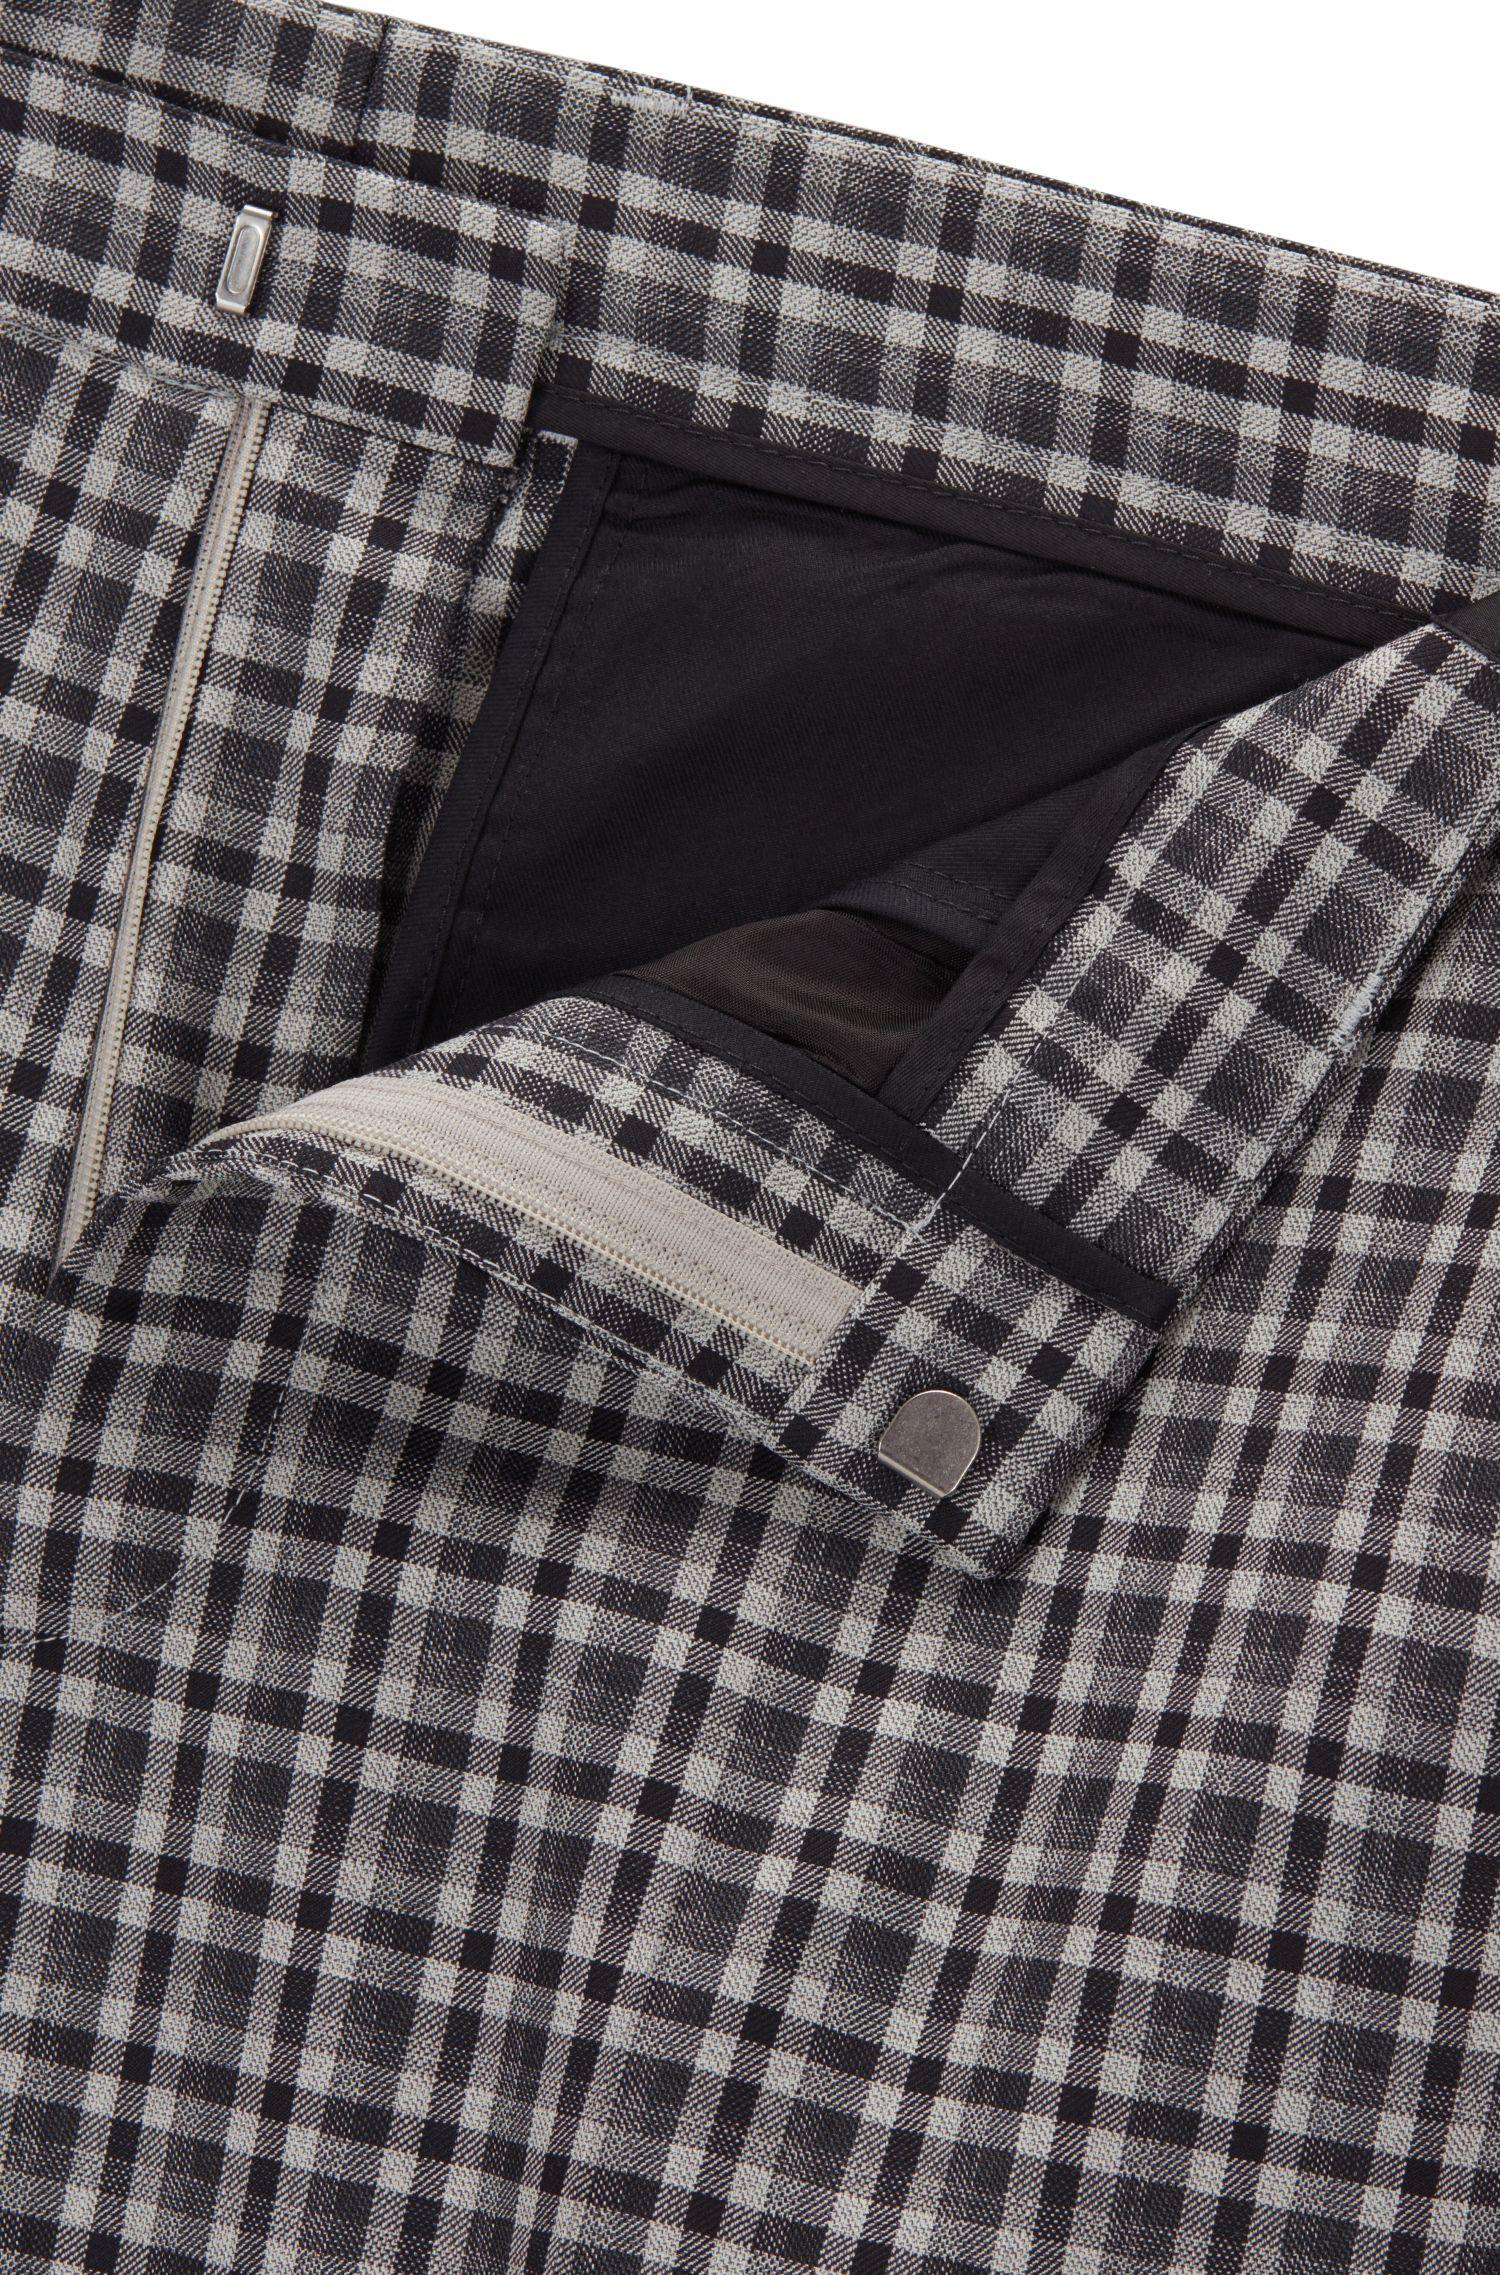 Checked Wool Dress Pant, Slim Fit   Pirko, Grey